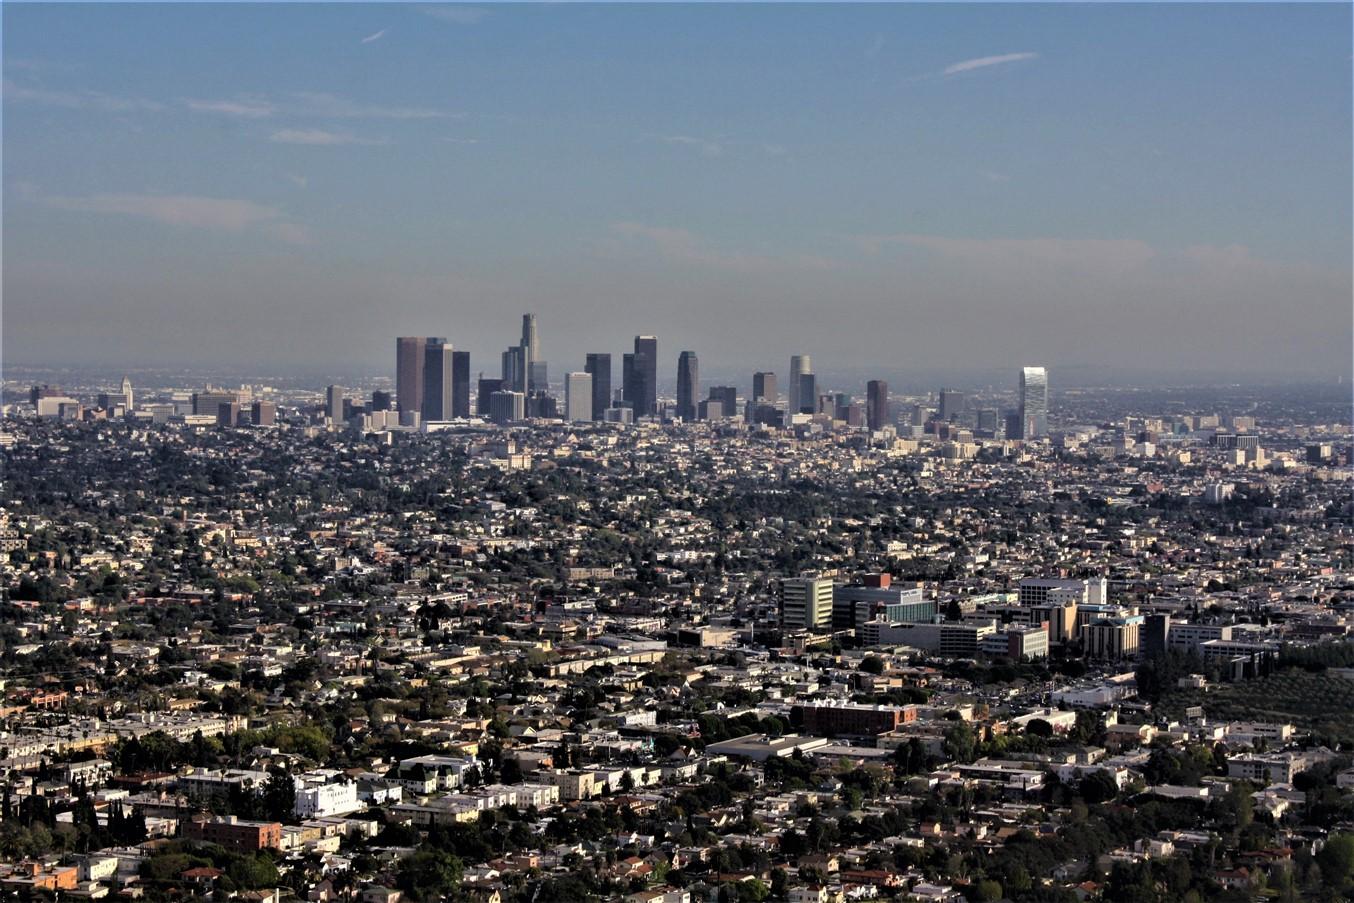 2012 03 10 133 Los Angeles Griffith Park.jpg